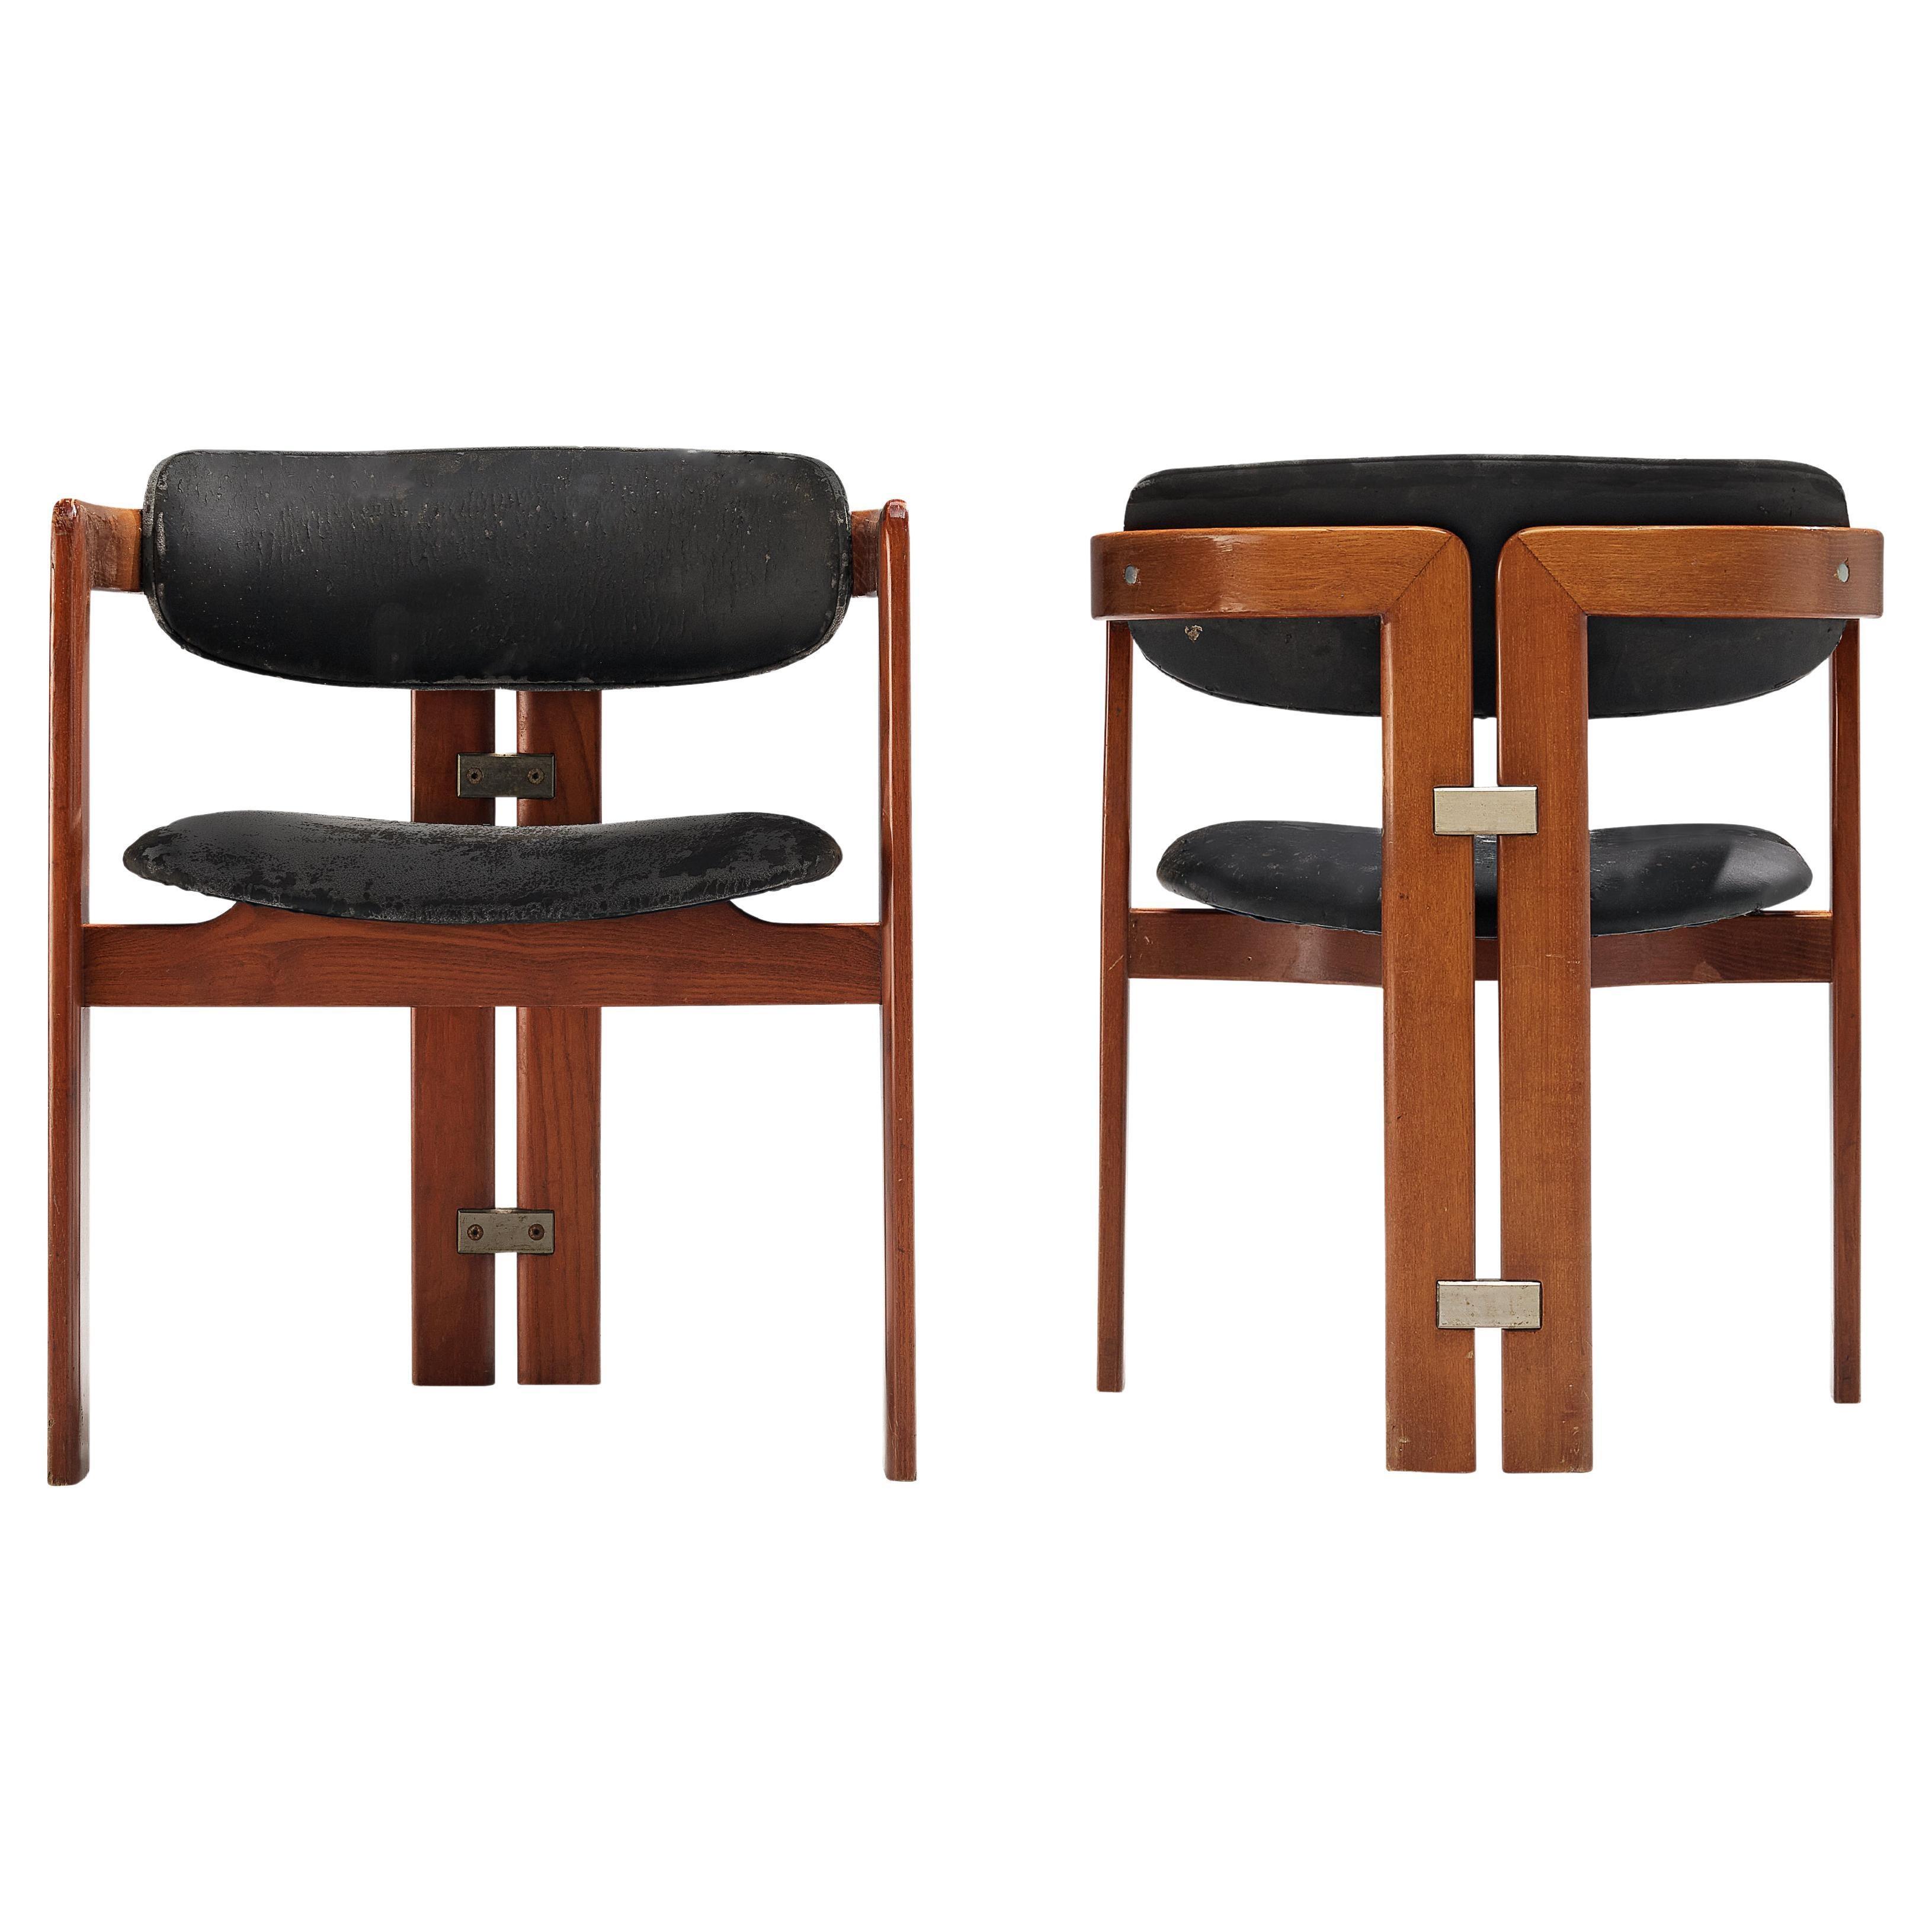 Augusto Savini for Pozzi 'Pamplona' Dining Chairs